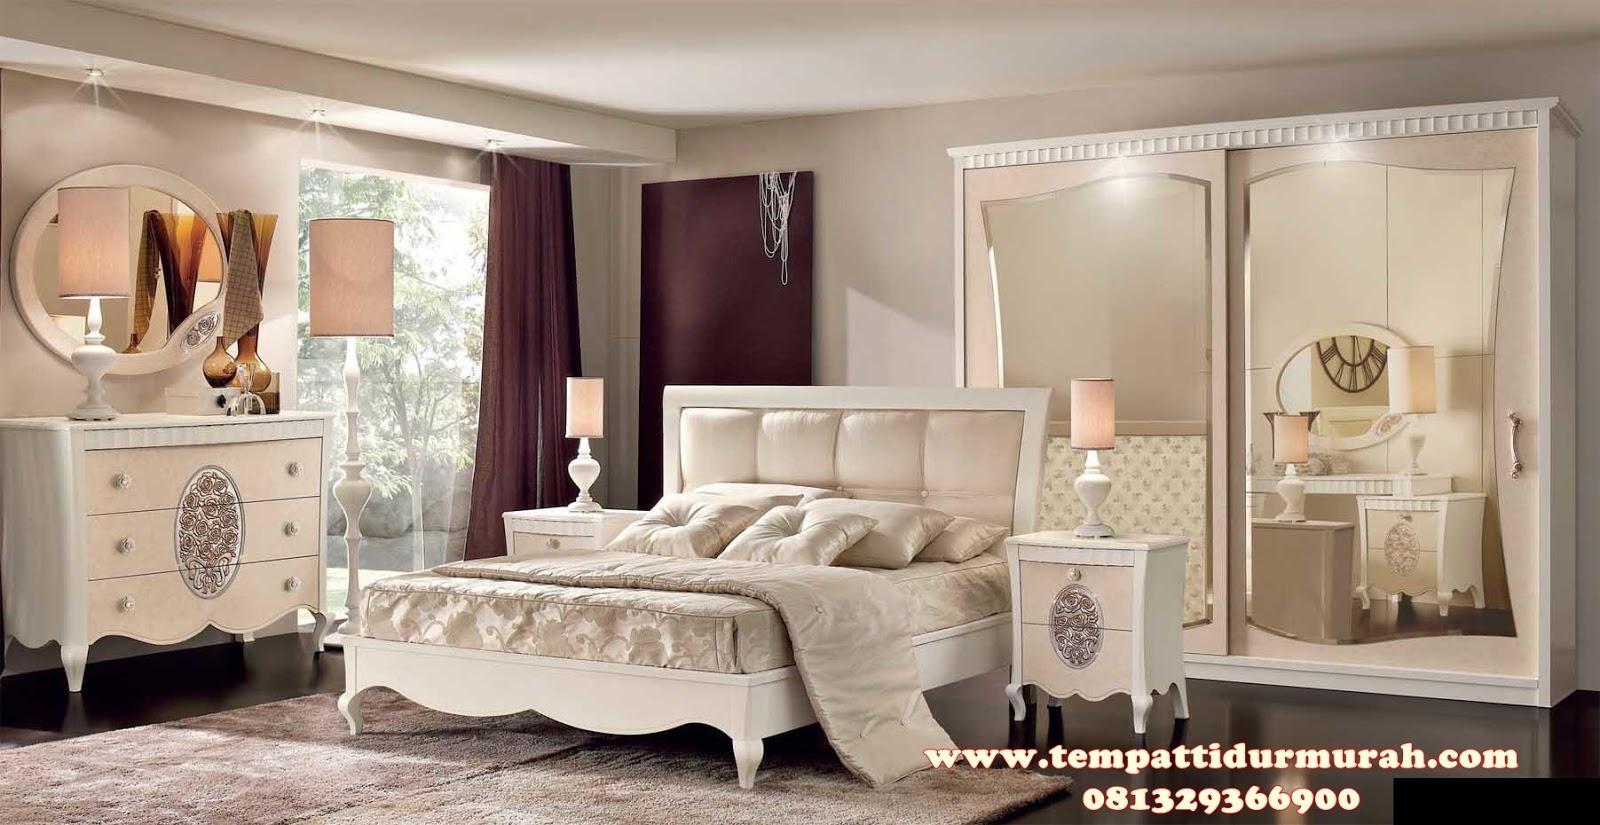 Kamar Tidur Minimalis Eropa Terbaru